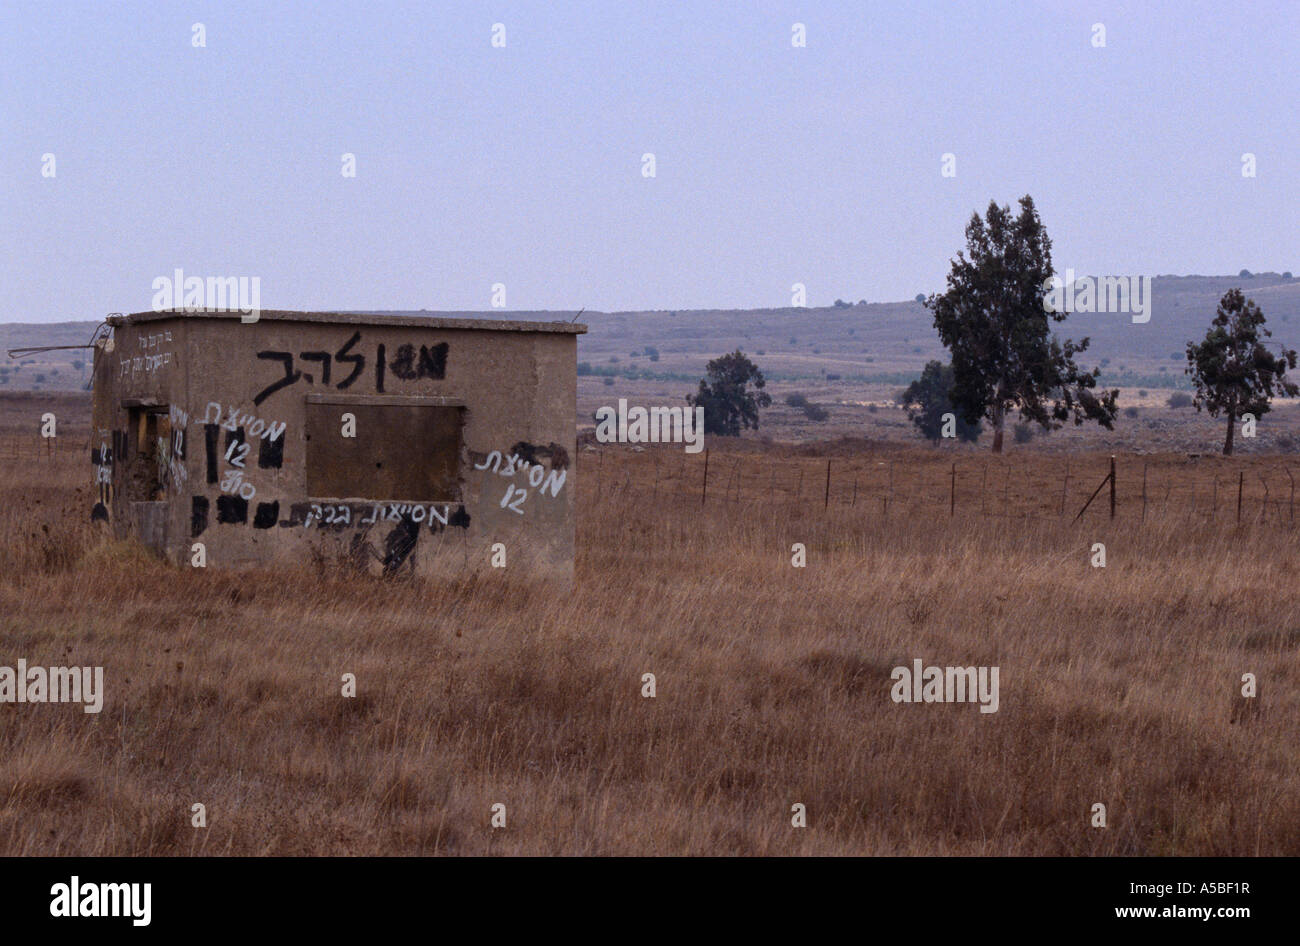 Graffiti on hut in remote area, Golan Heights, Jerusalem - Stock Image